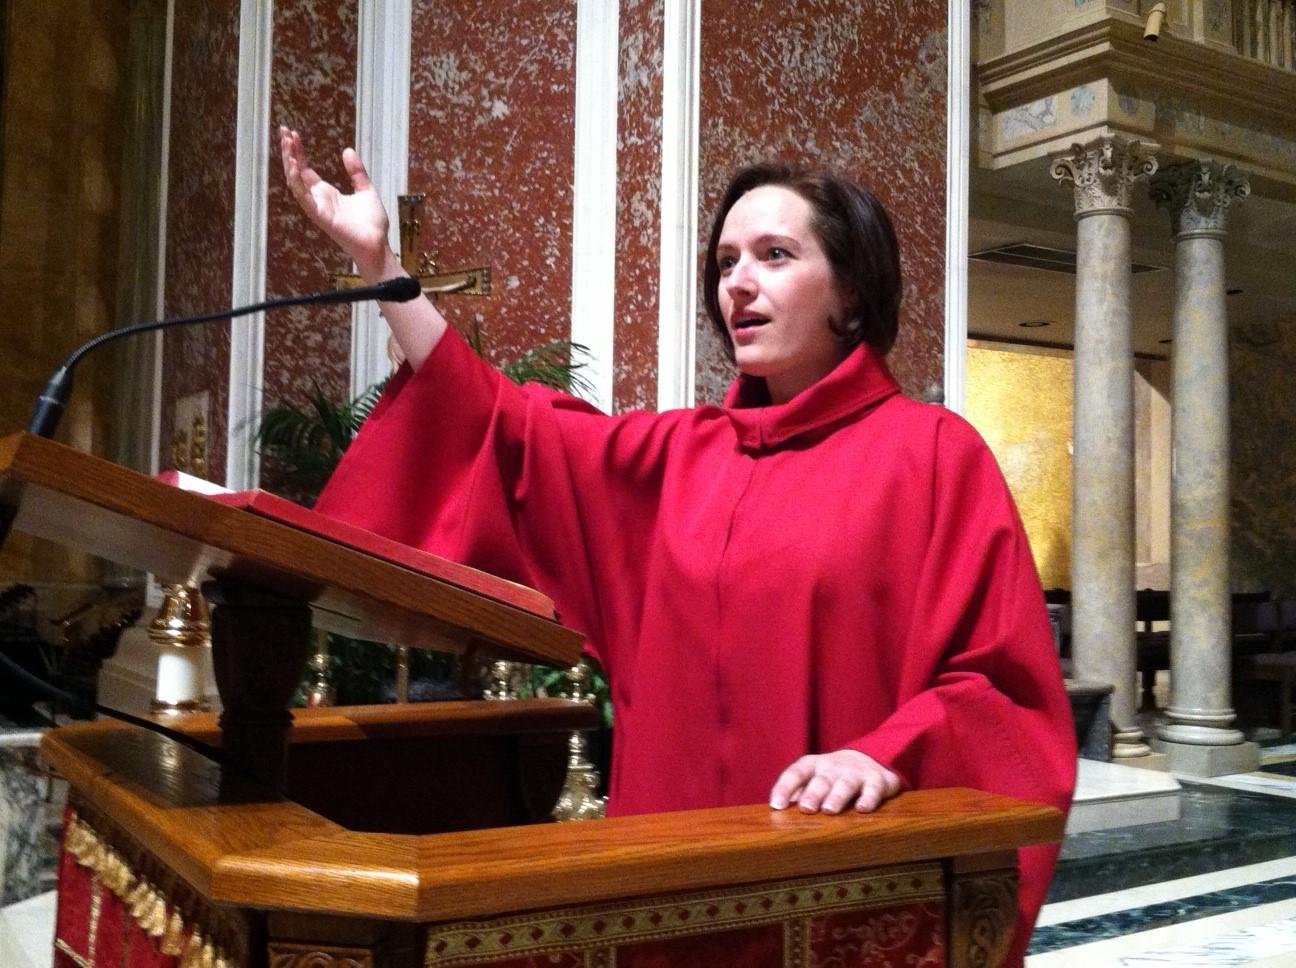 Margaret Brown, Cathedral of St Matthew the Apostle. Washington, D.C.